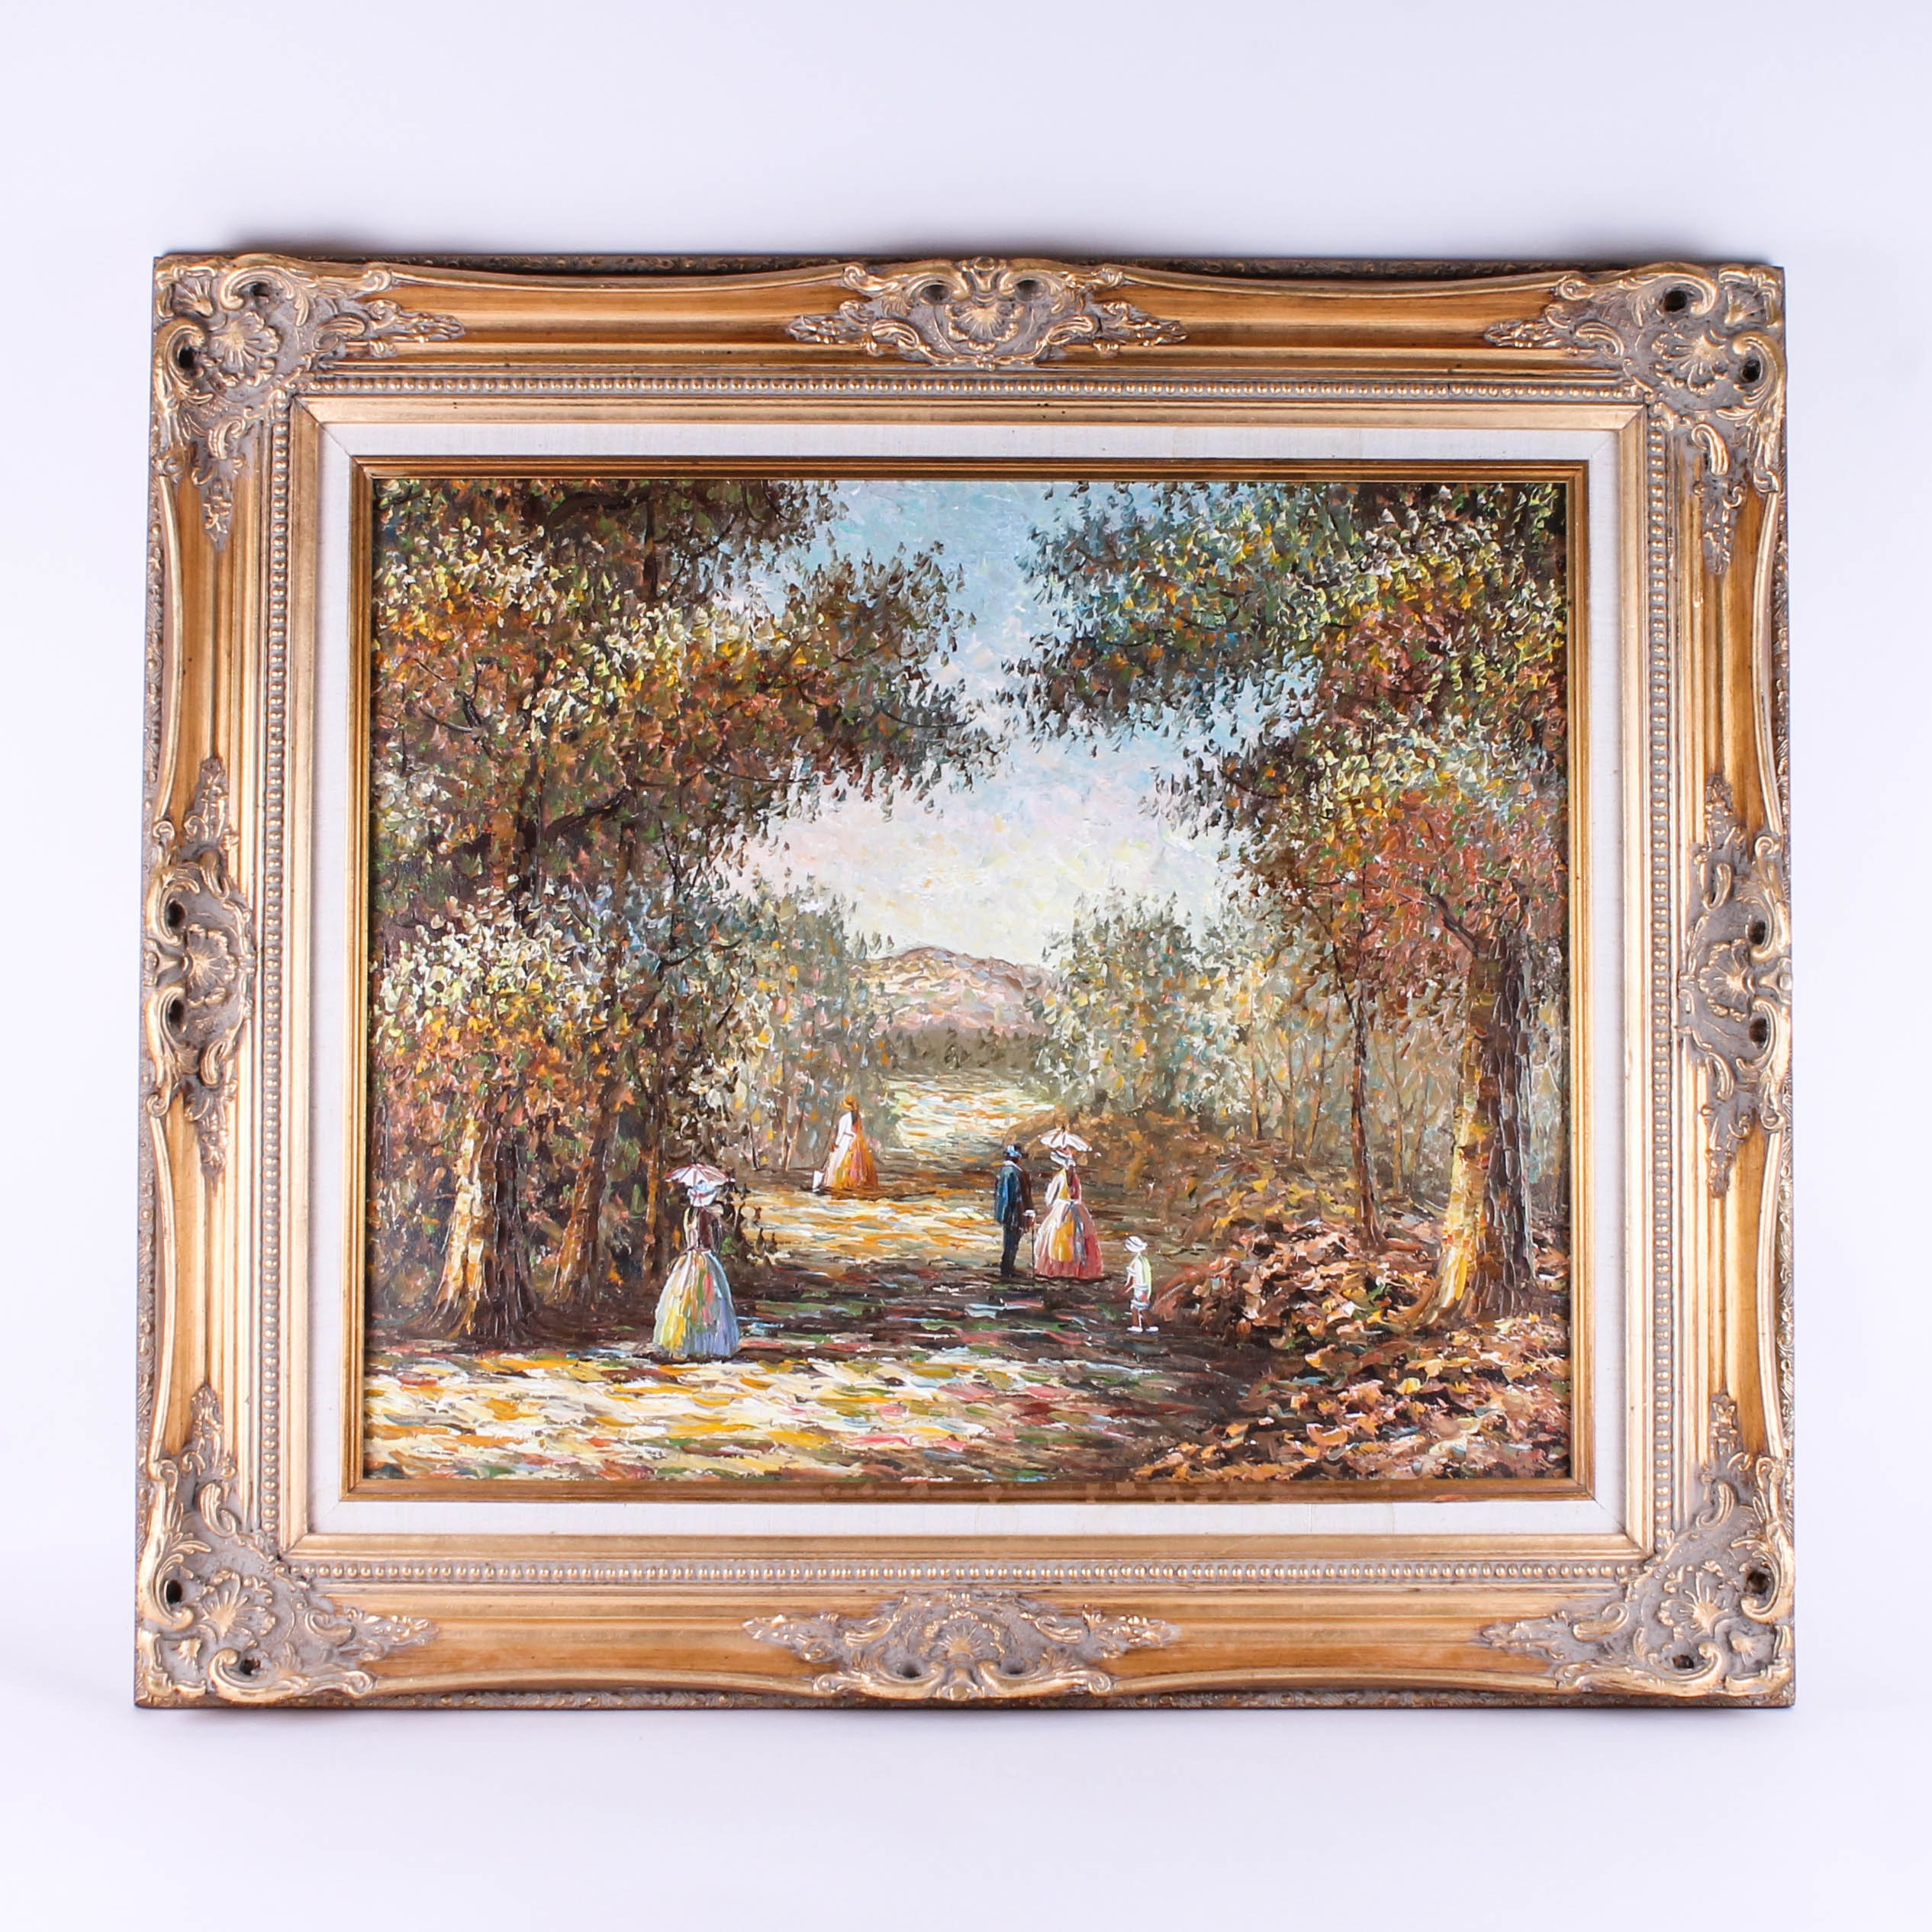 Original Framed Oil Painting